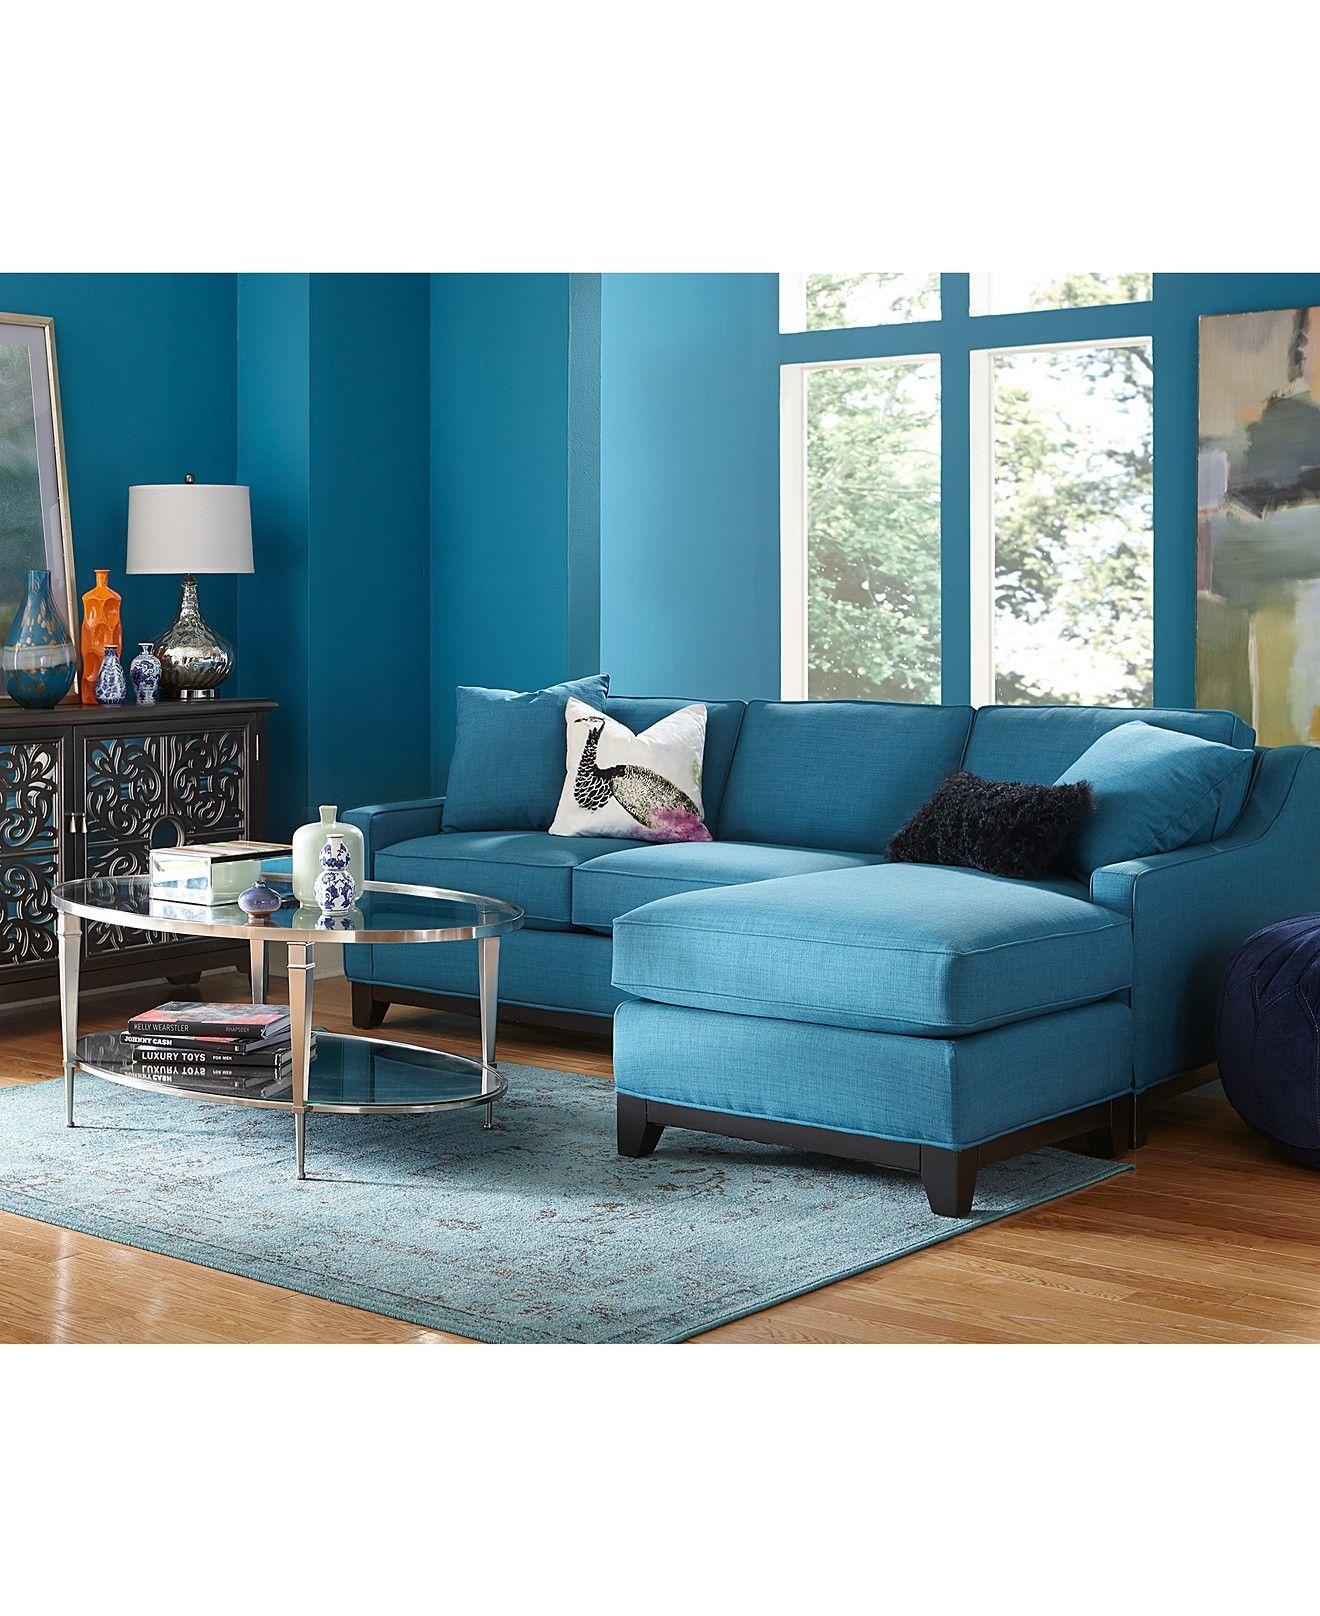 Fantastic Keegan Fabric 2 Piece Sectional Sofa Custom Colors Bralicious Painted Fabric Chair Ideas Braliciousco